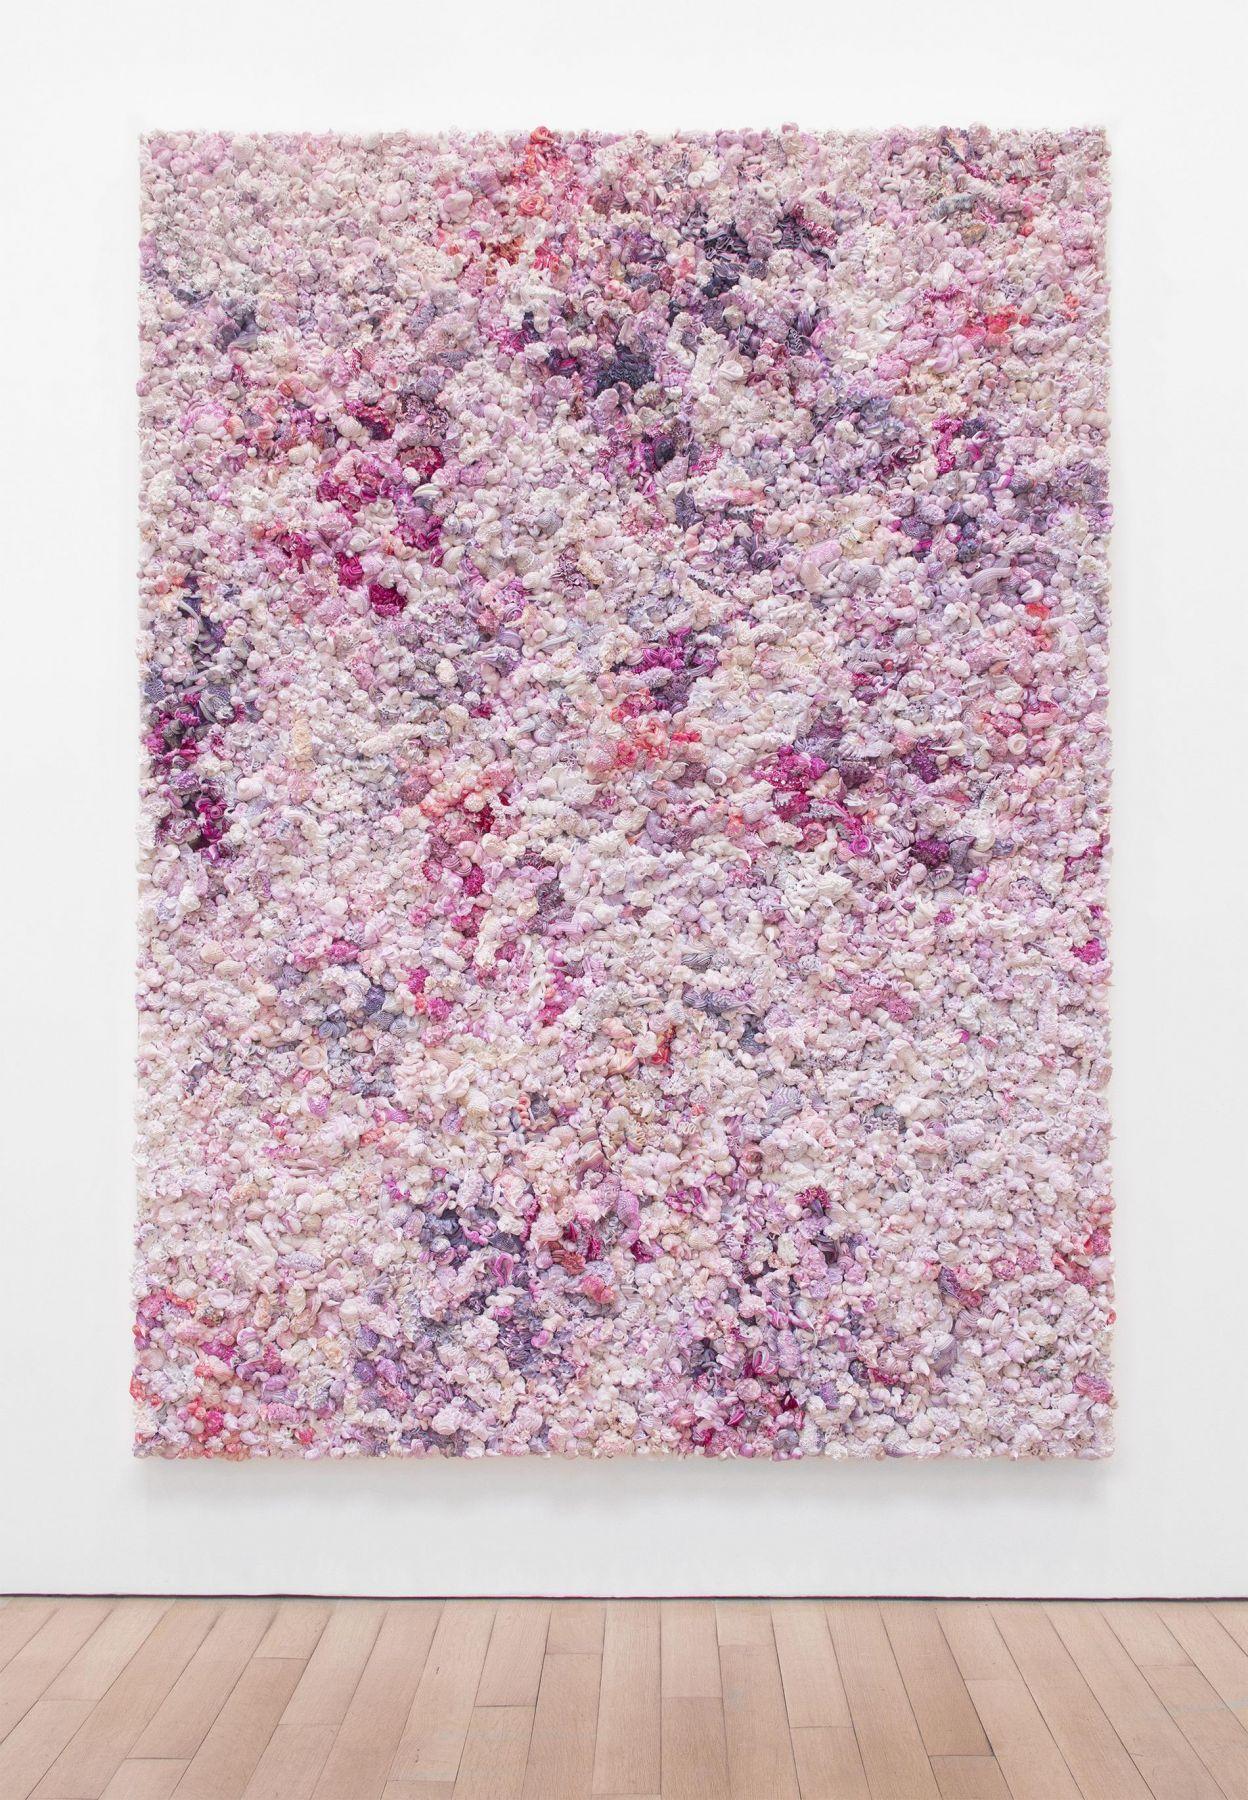 , Under Heaven -- 2808TV1512,2015,Oil on canvas, aluminum,90 3/8 x 70 3/4 x 5 1/2 in.